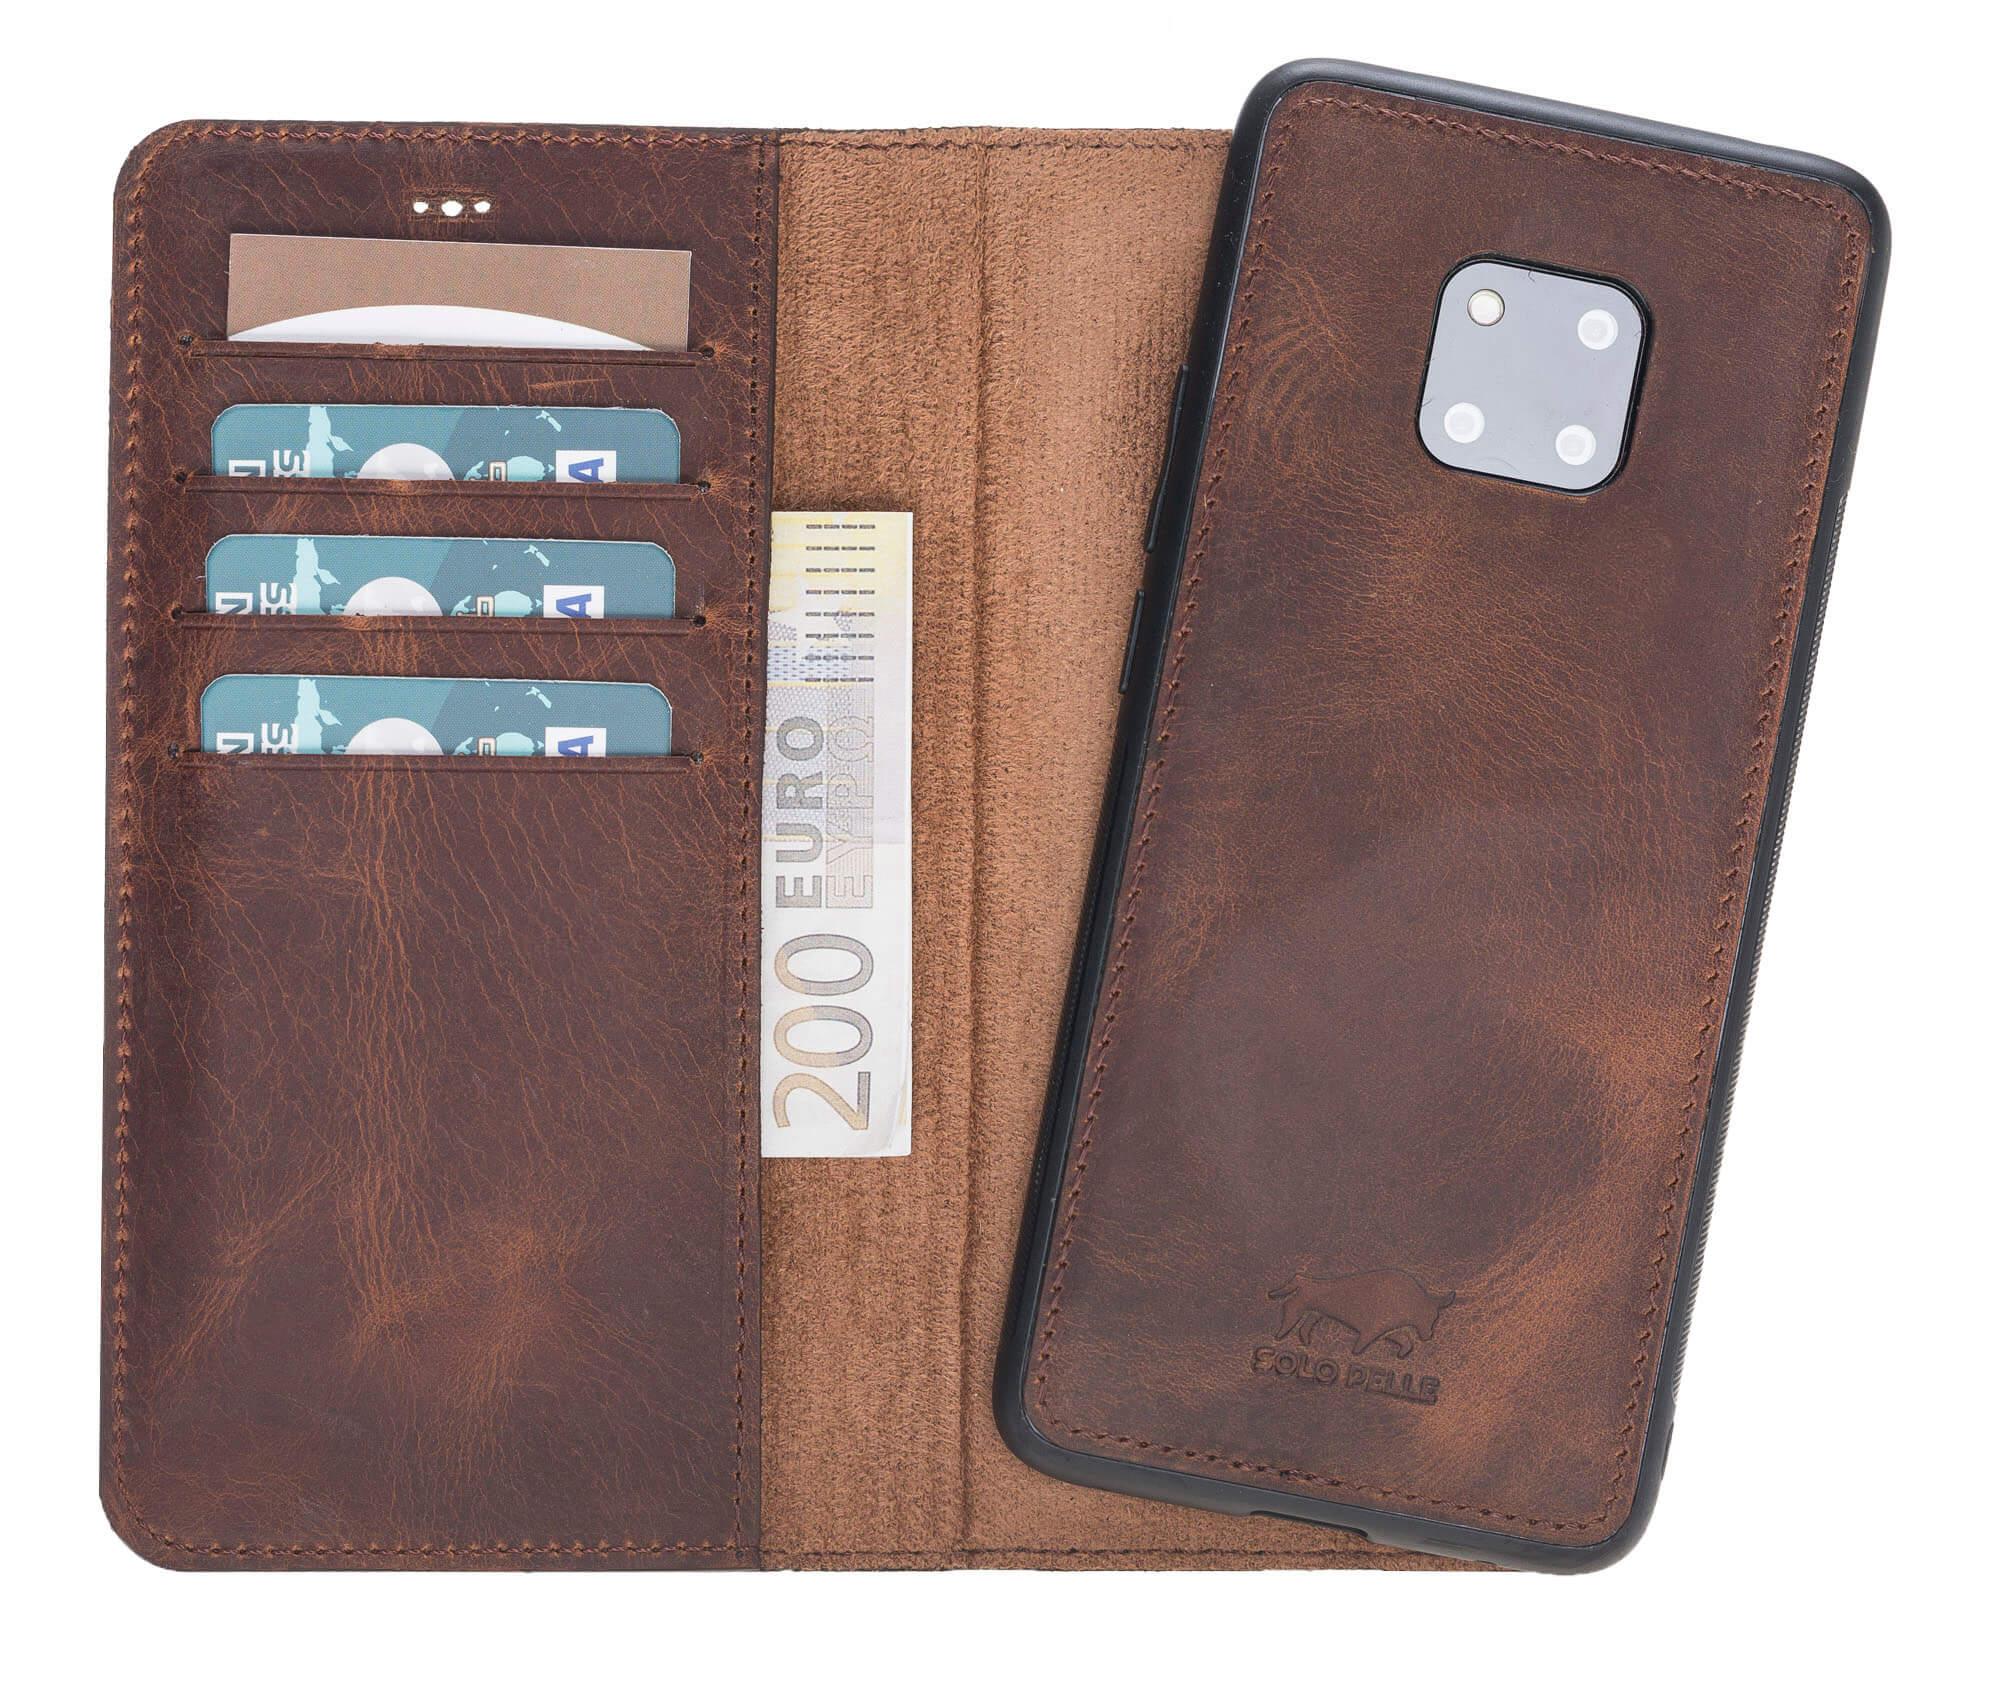 "Lederhülle abnehmbar ""Harvard"" für das Huawei Mate 20 Pro in Vintage Braun Leder Hülle Tasche Lederhülle Ledertasche"